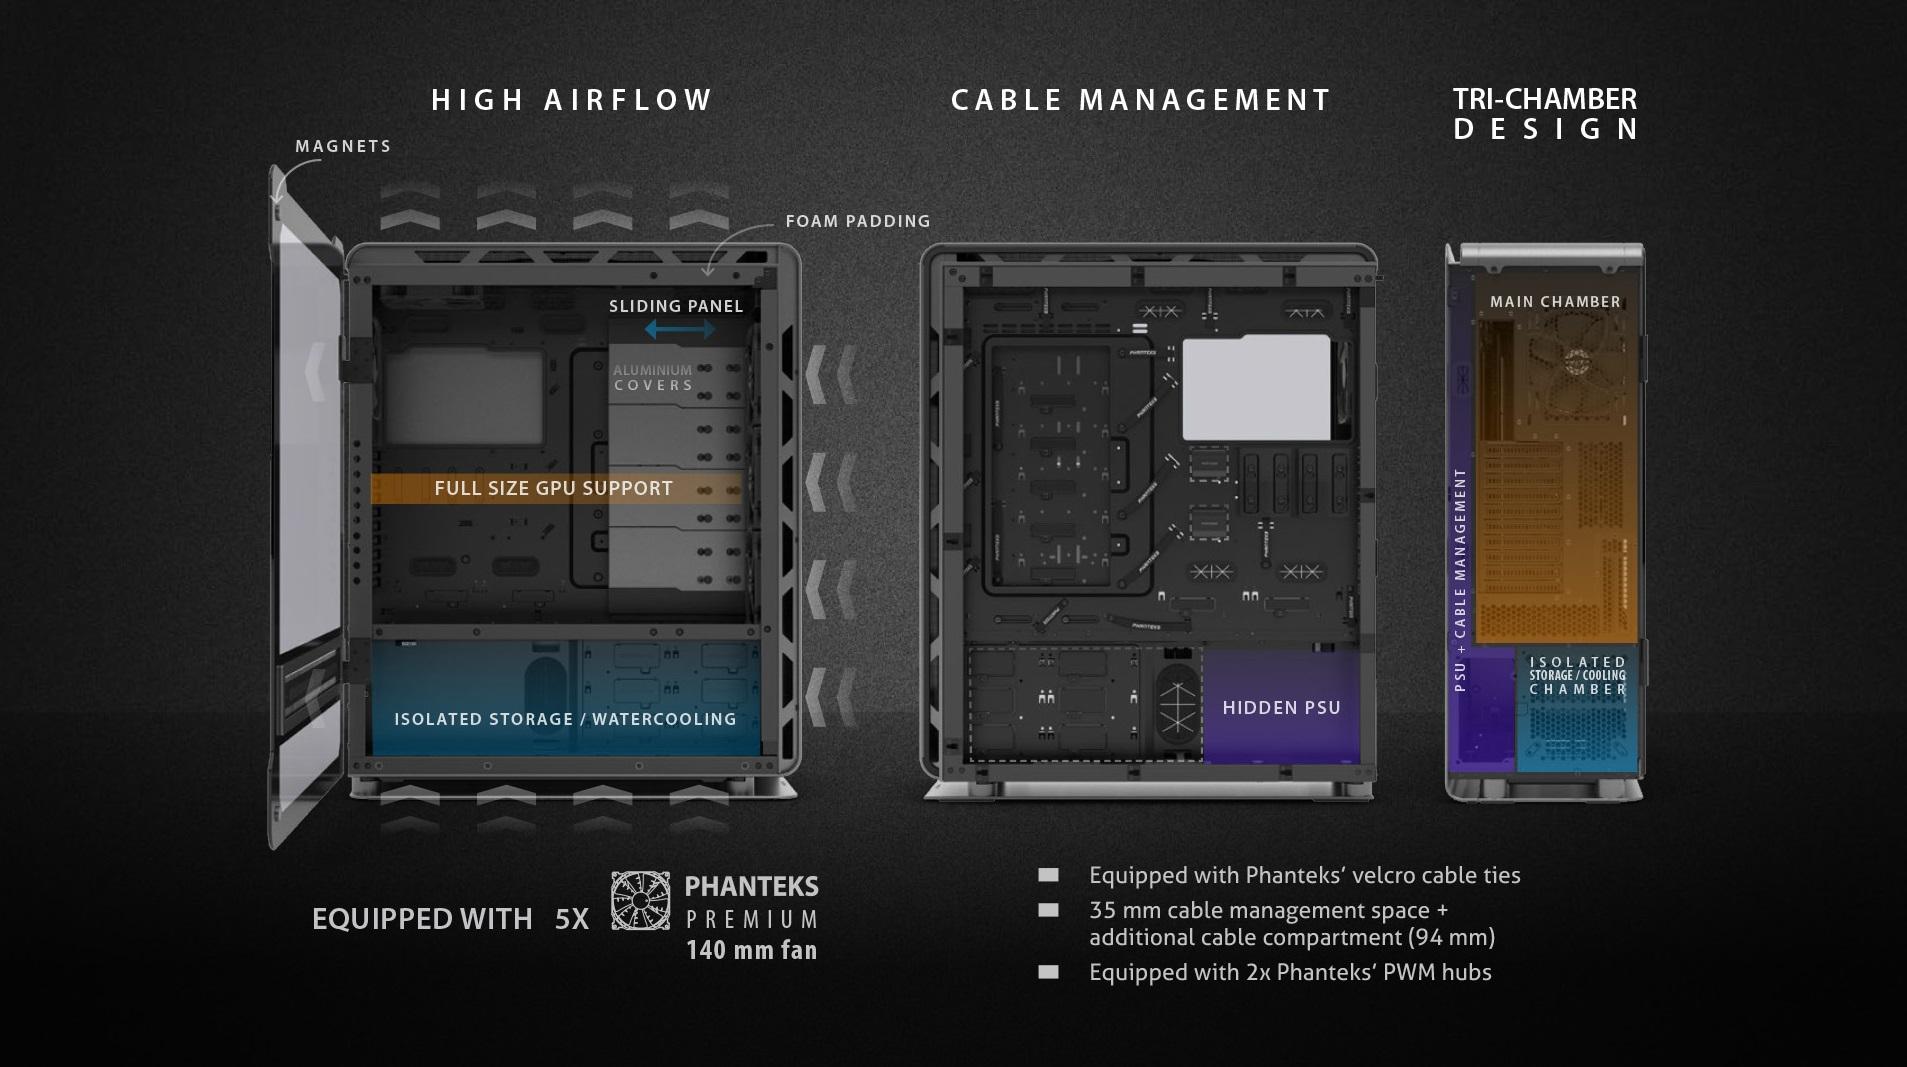 Phanteks Enthoo Elite Extreme RGB Lighting, Tempered Glass Window, Dual System Support thiết kế 2